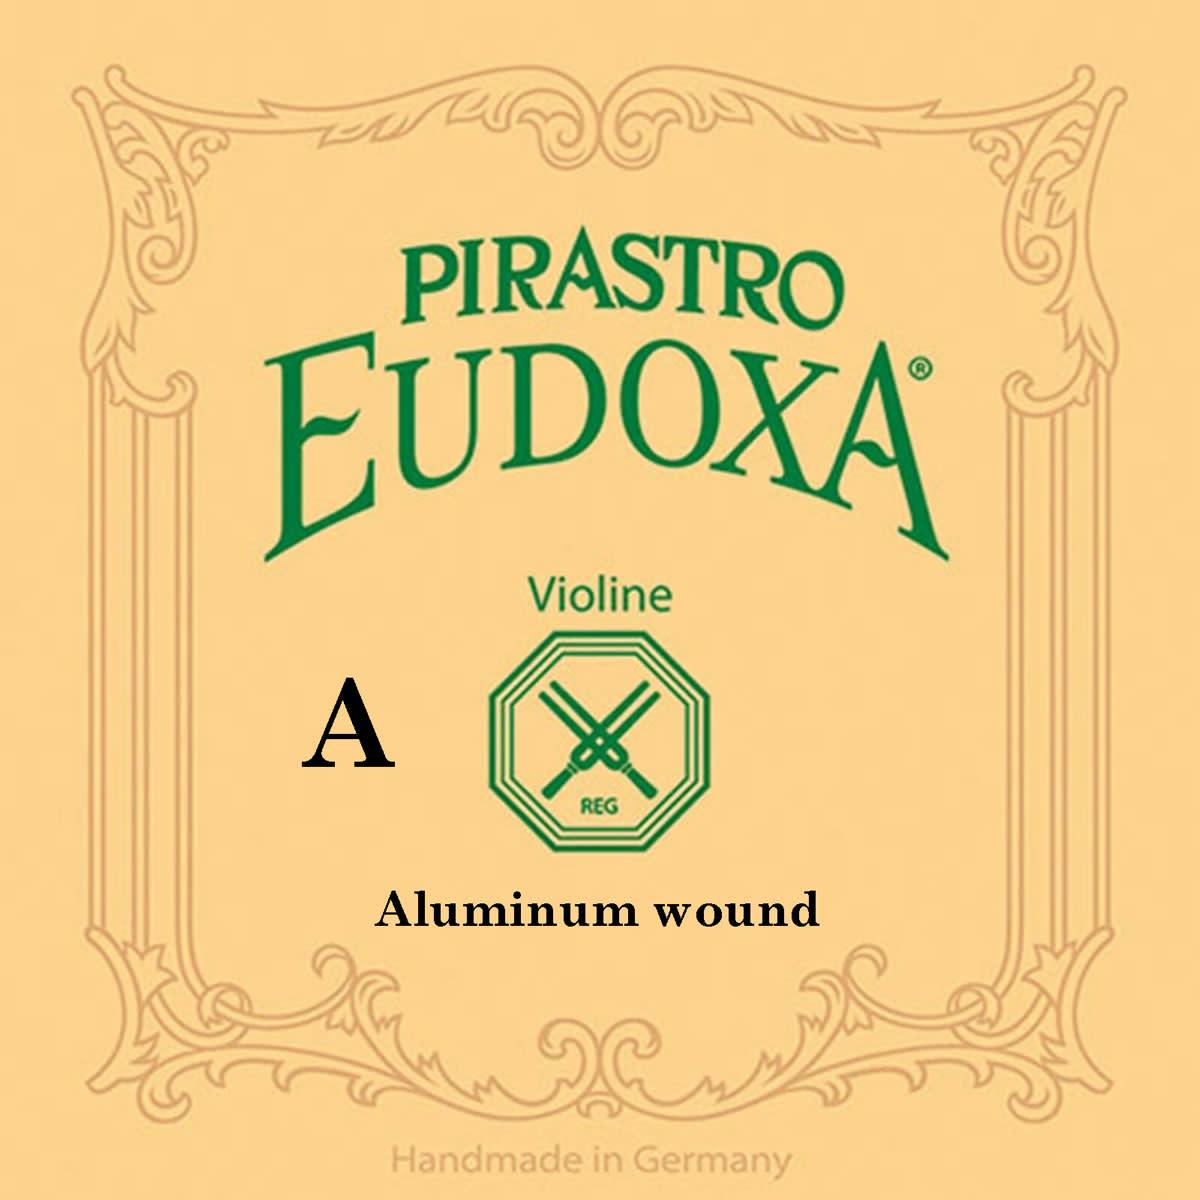 Pirastro Pirastro EUDOXA violin A string, aluminum wound on gut, 13 3/4, in envelope